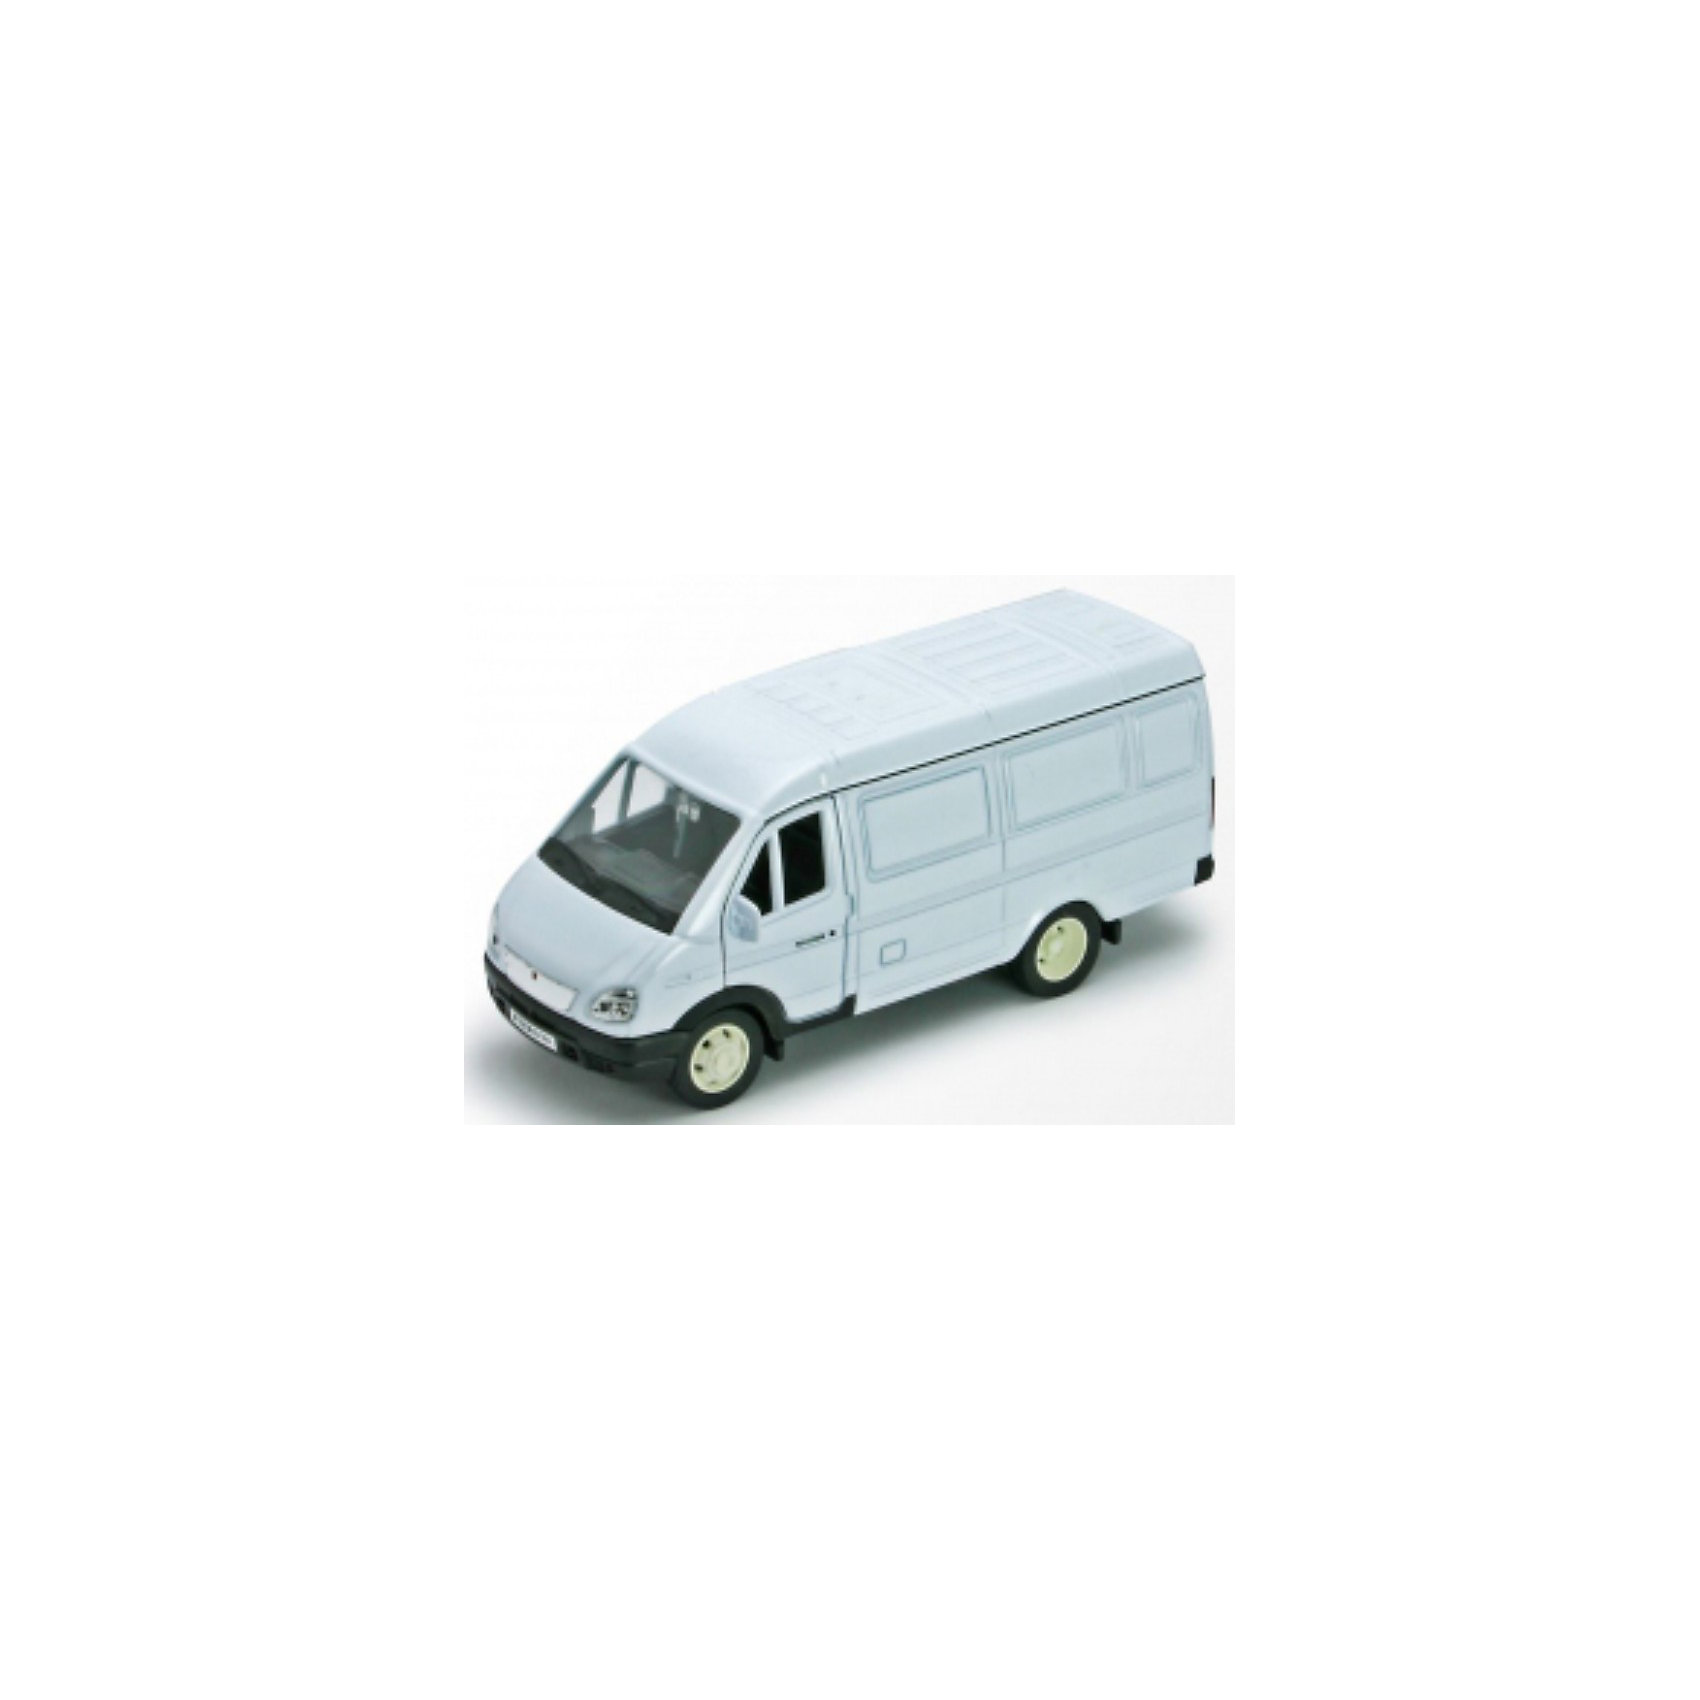 Welly Welly Модель машины ГАЗель фургон машинки welly игрушка модель машины автокран